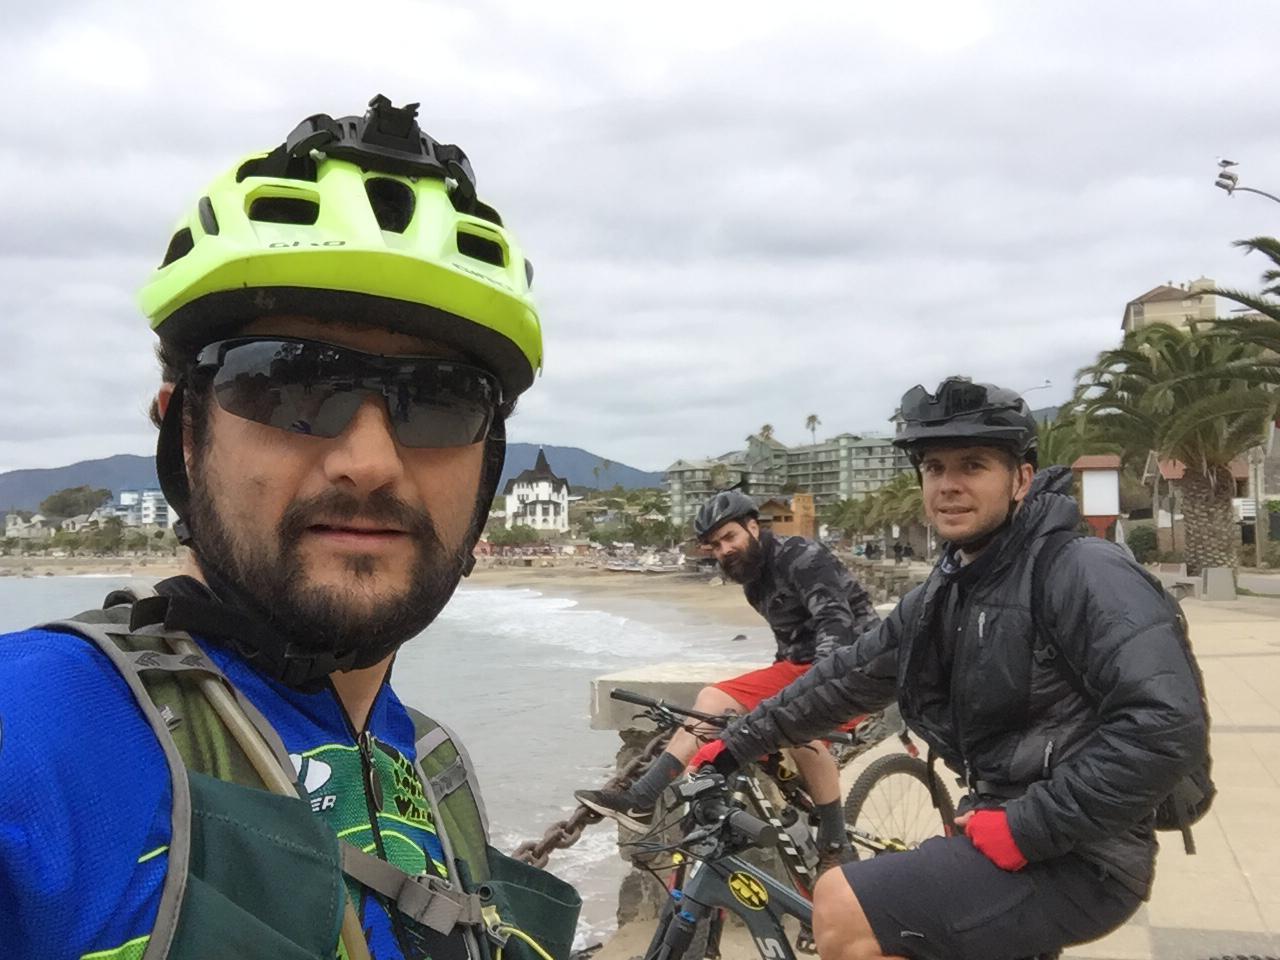 Biketur Cordillera de la costa